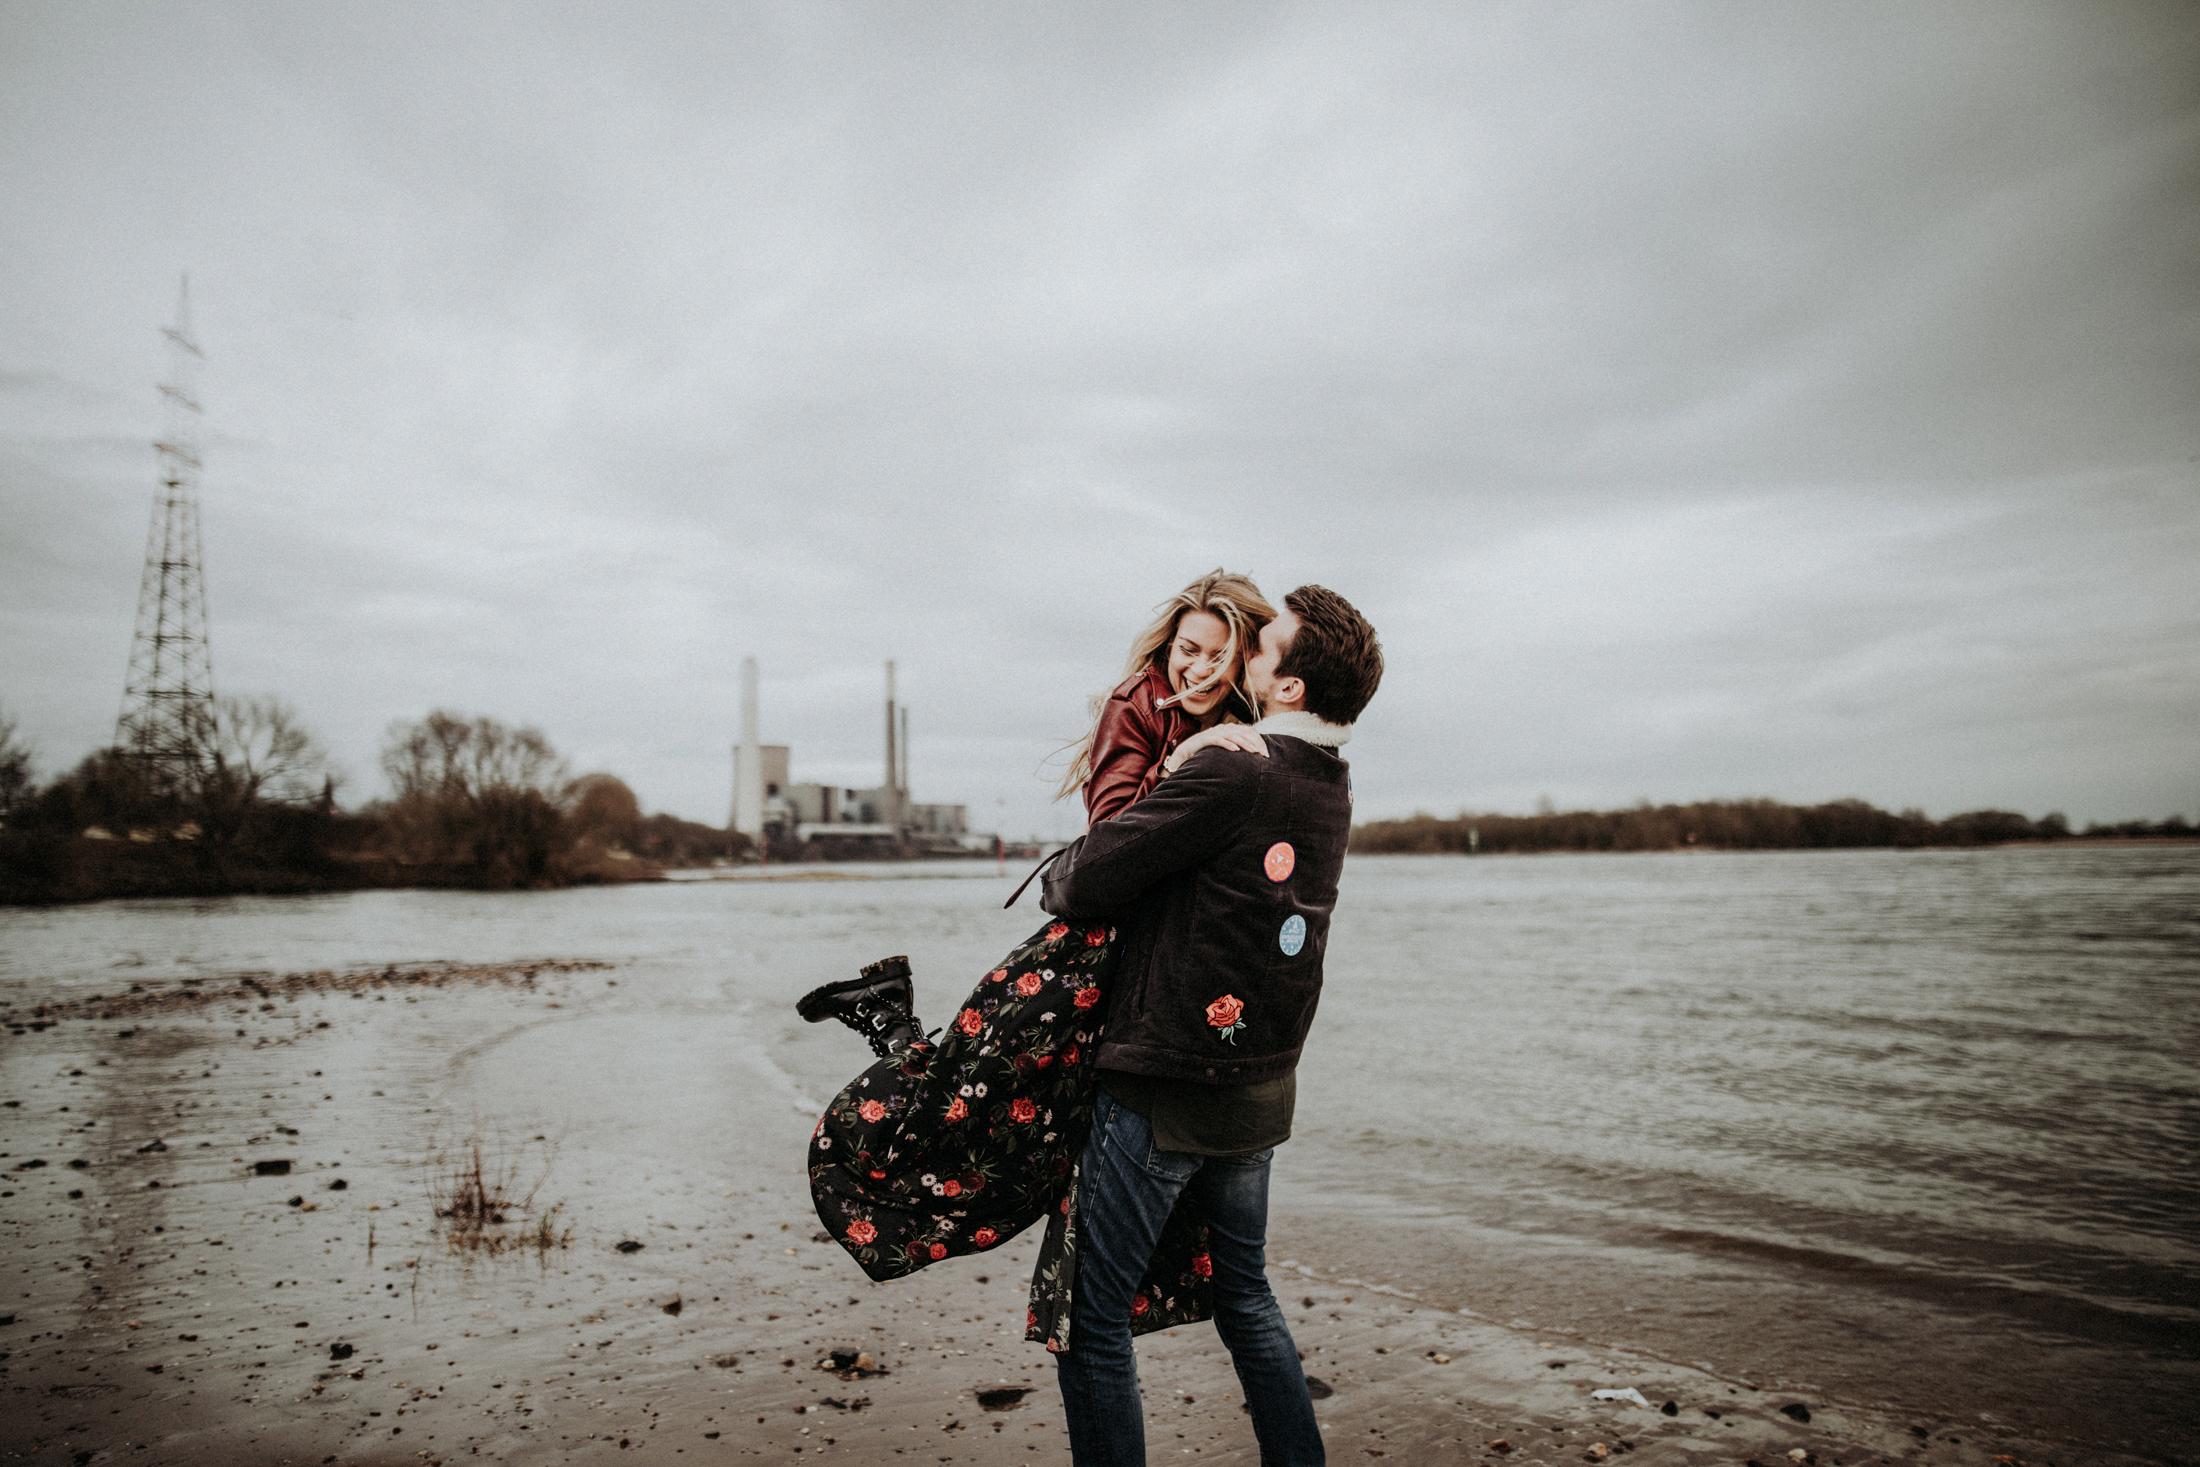 Wedding_Photographer_Mallorca_DanielaMarquardt_Photography_CanaryIslands_Lanzarote_Iceland_Tuscany_Santorini_Portugal_NewYork_Spain_Elopement_Hochzeitsfotograf_CK49